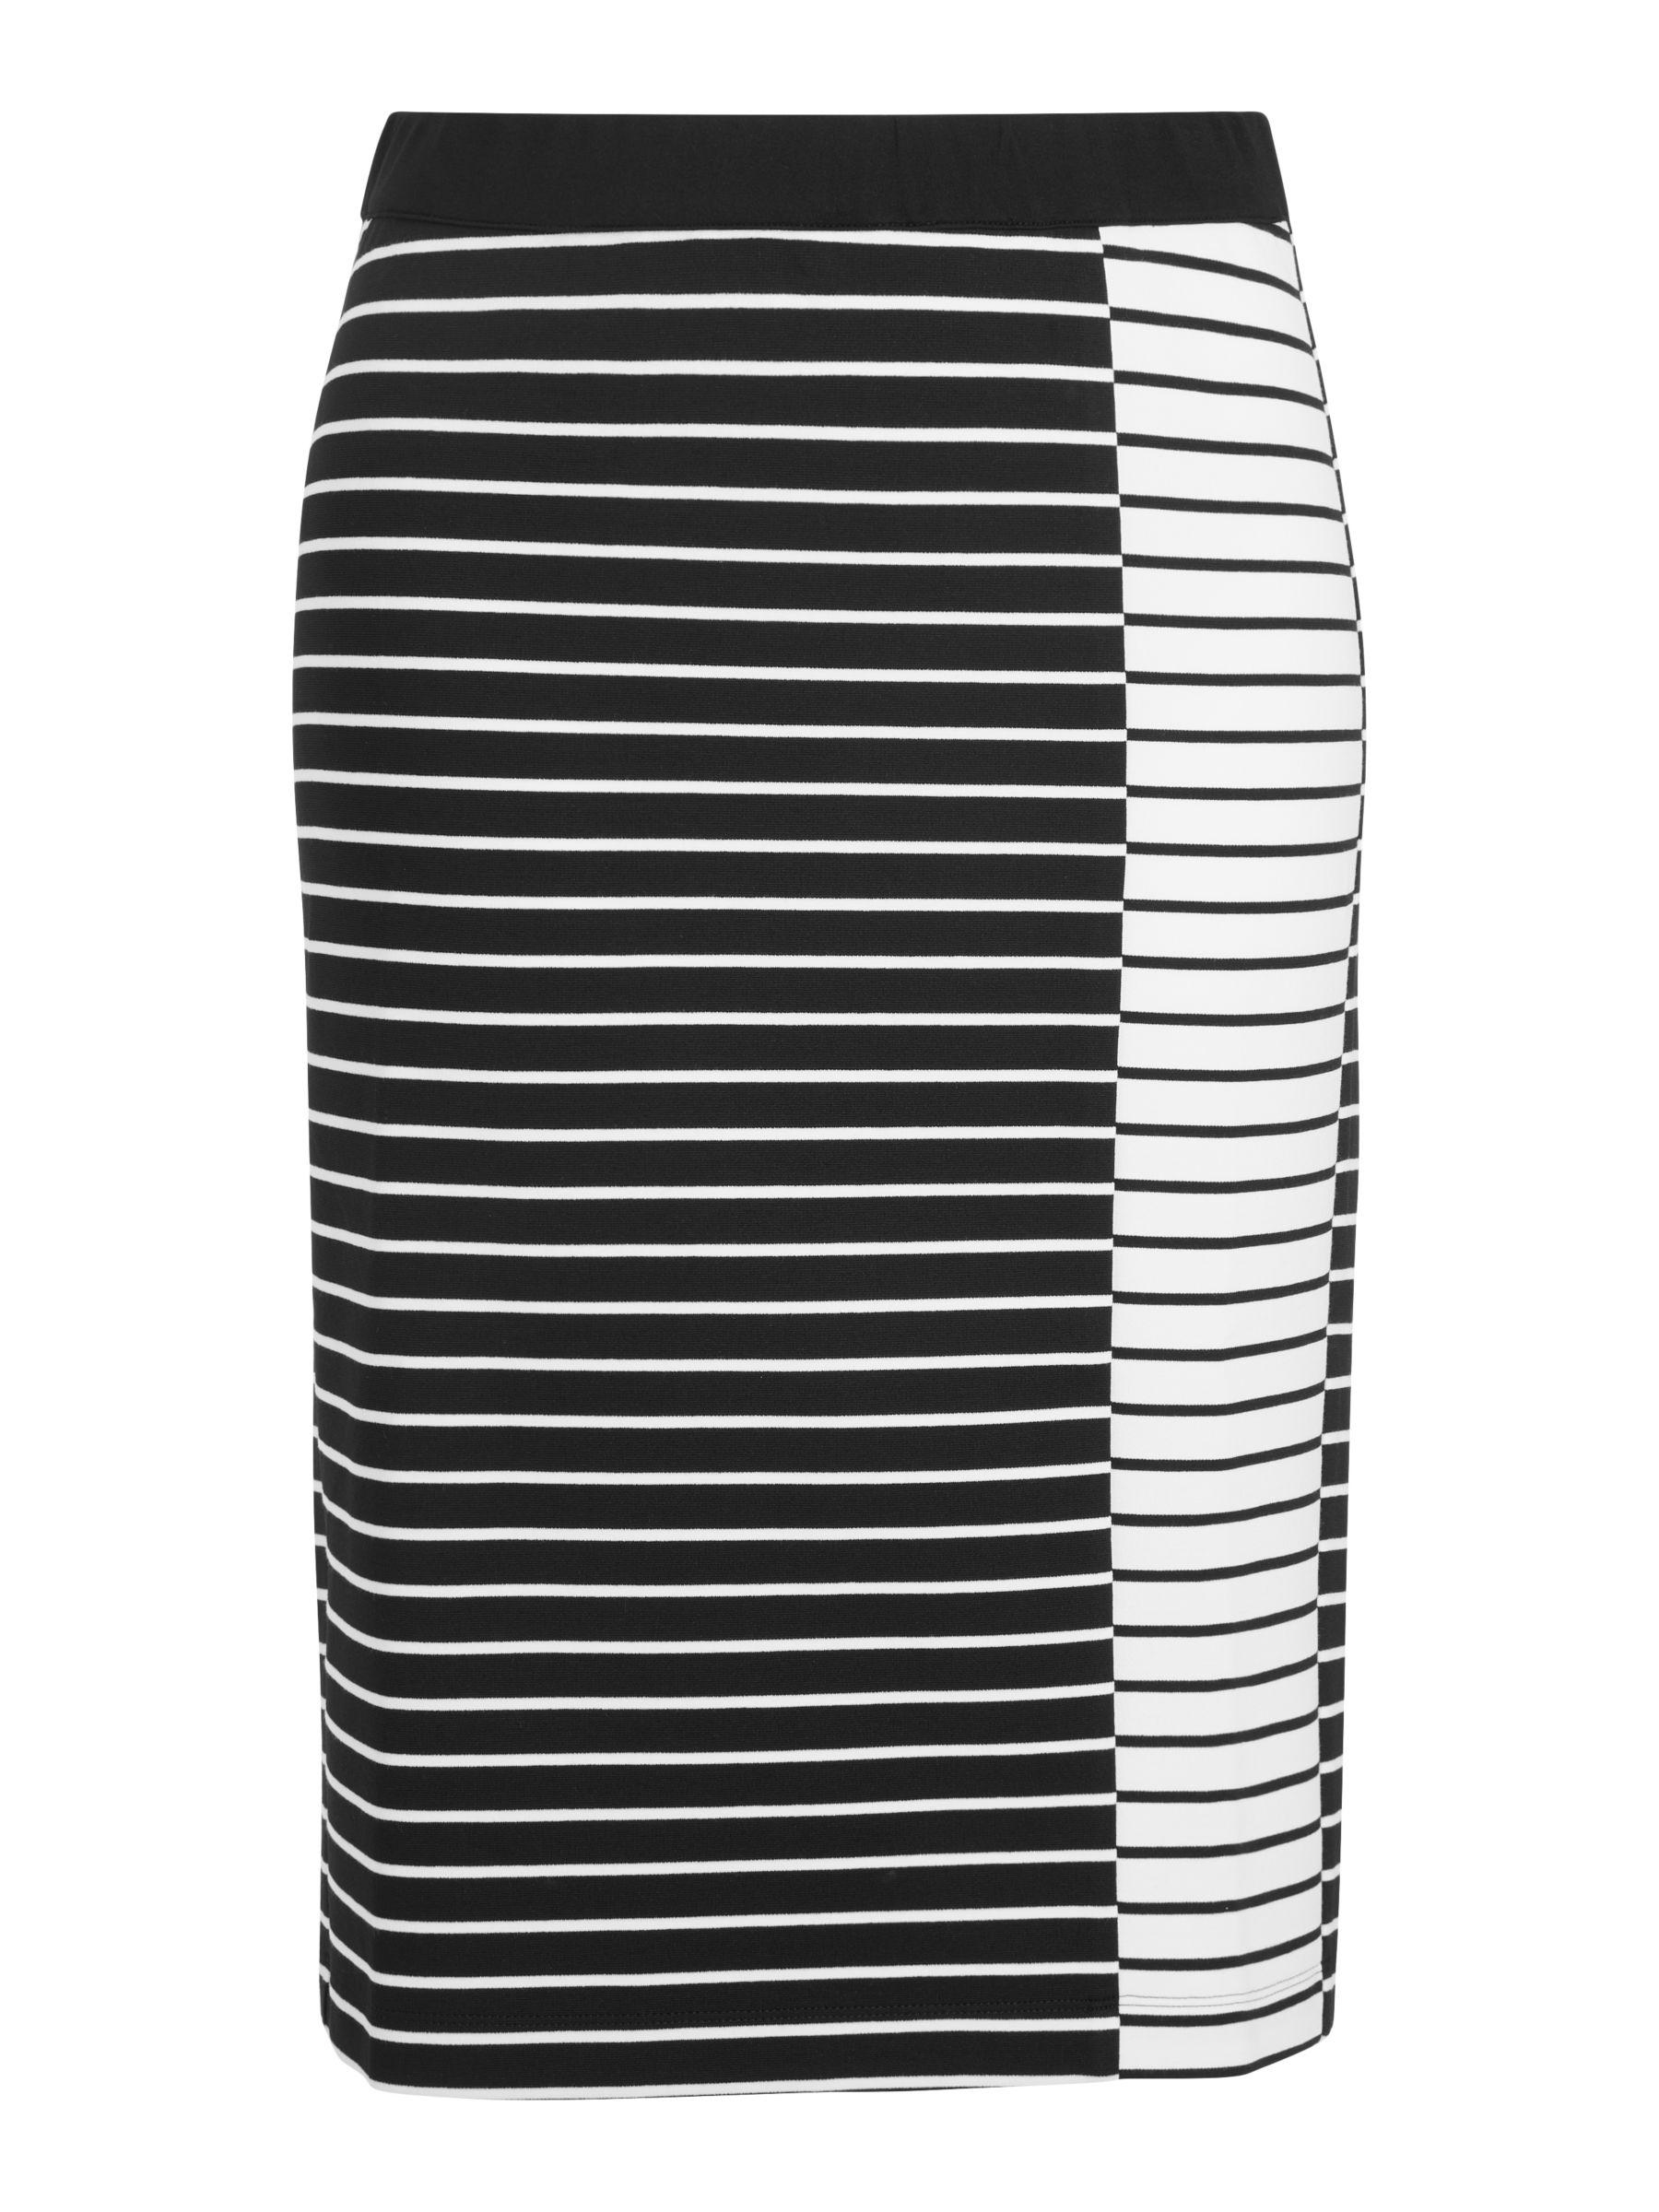 Persona by Marina Rinaldi Persona by Marina Rinaldi Olmo Stripe Skirt, Black